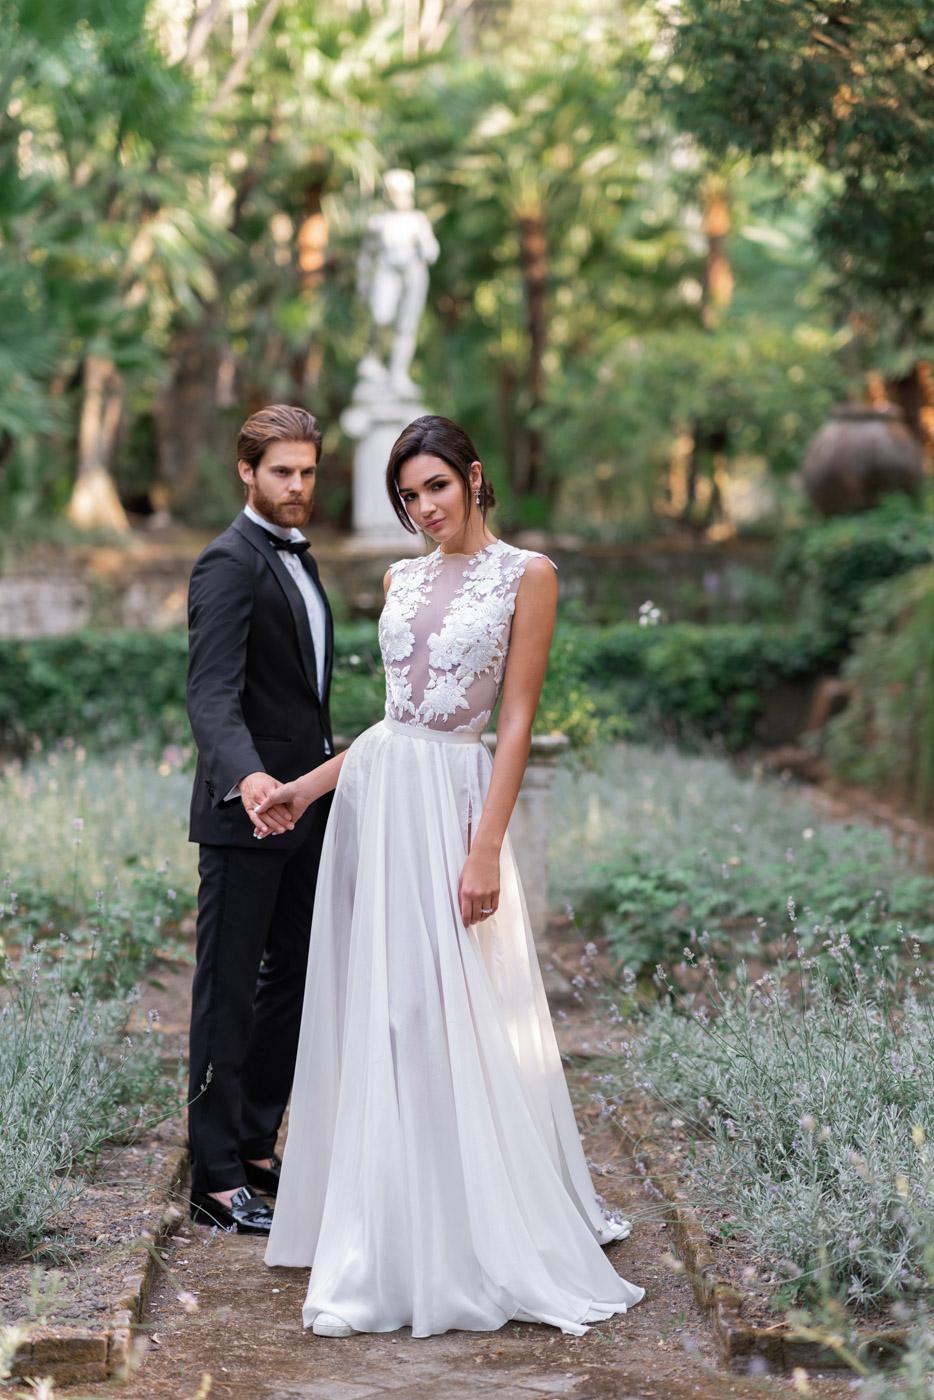 Wedding couple in the gardens at Villa Astor, Sorrento, Italy - photo by Adagion Studio